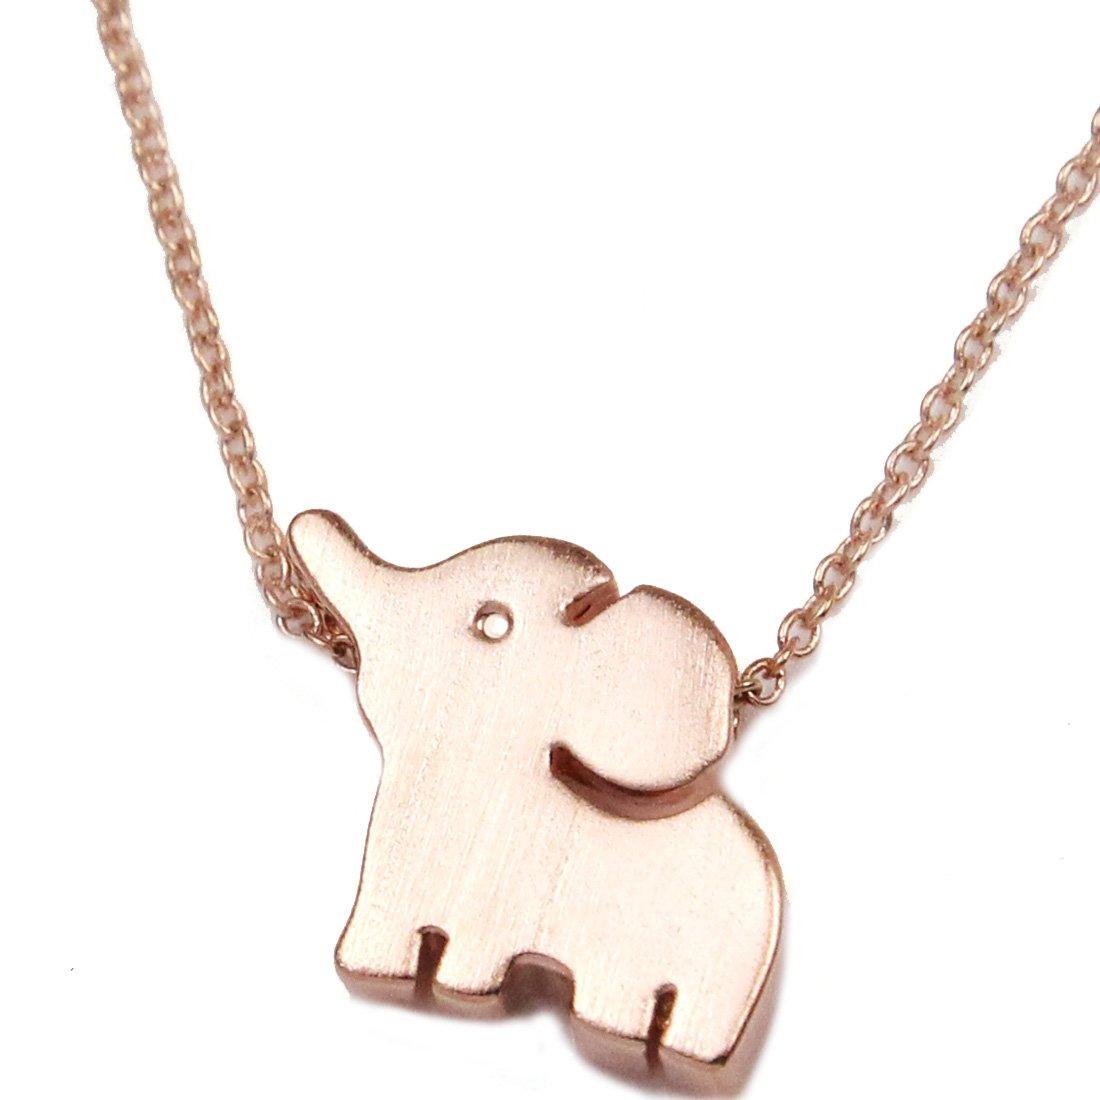 FC Rose Gold GP None Stone Elephant Pendant Necklace